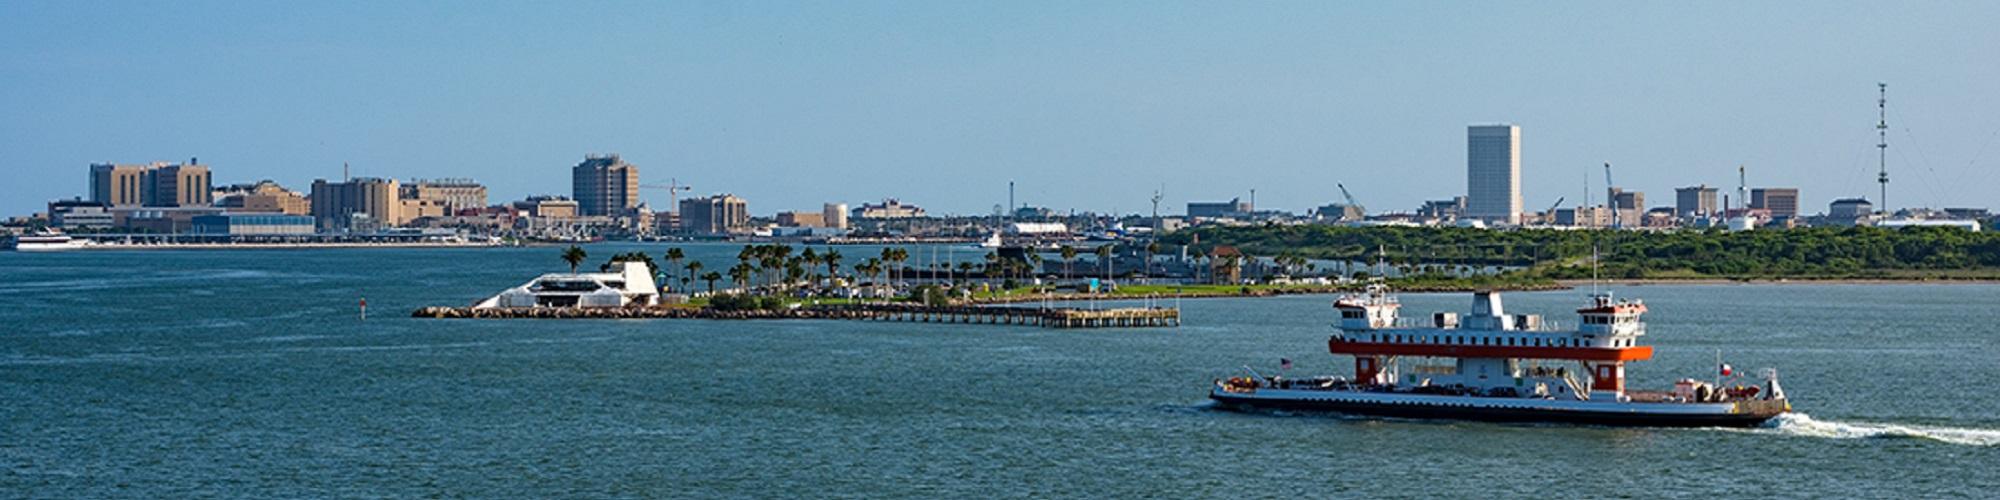 ferry boat crossing from Bolivar Peninsula to Galveston Island